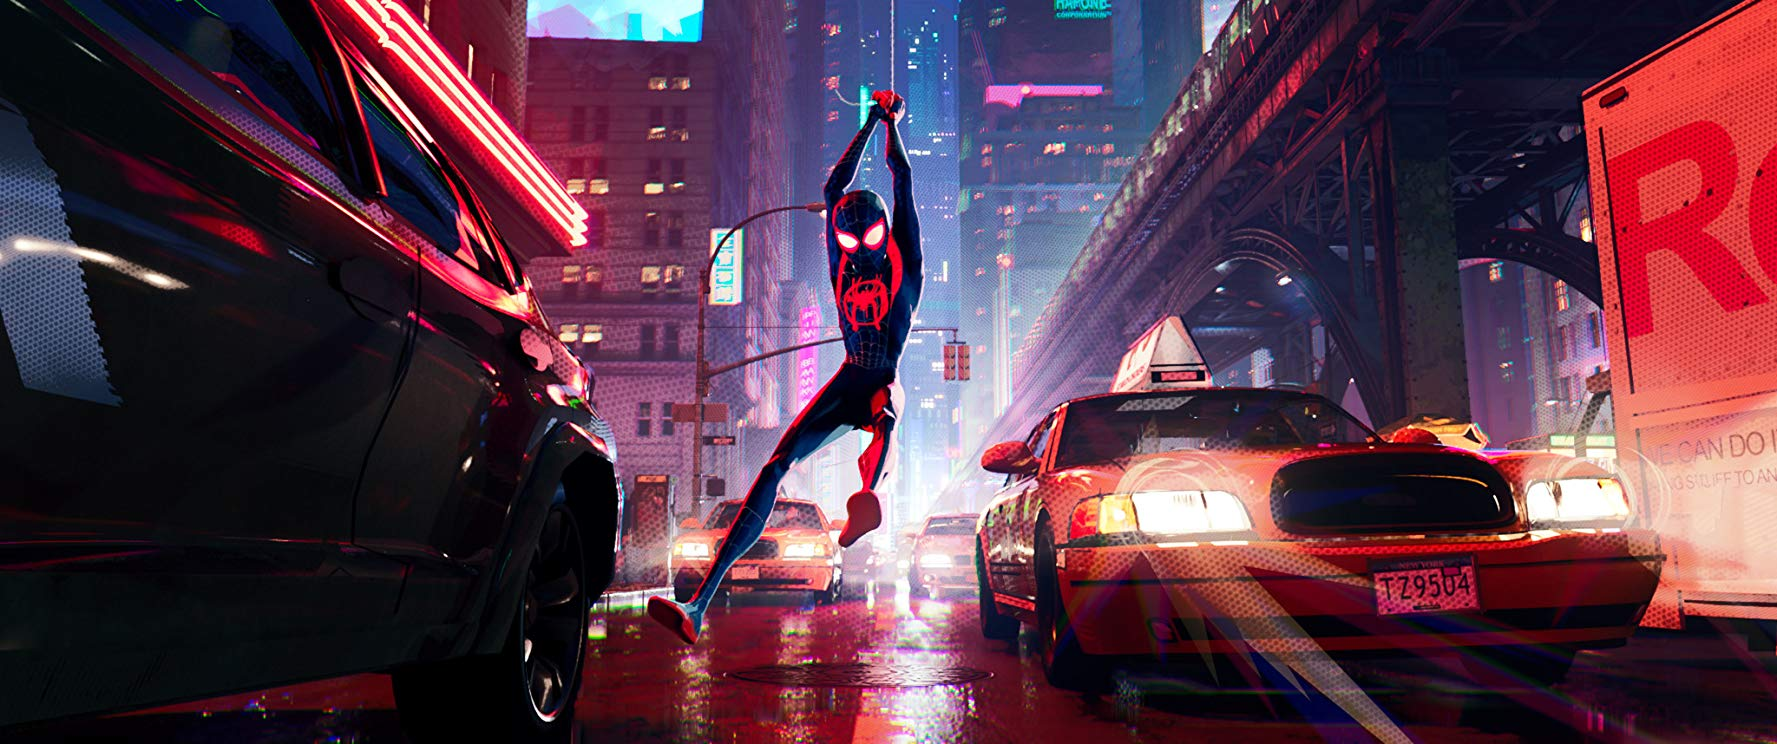 Spider Man Into the spider verse 2018 online uncle Aaron death